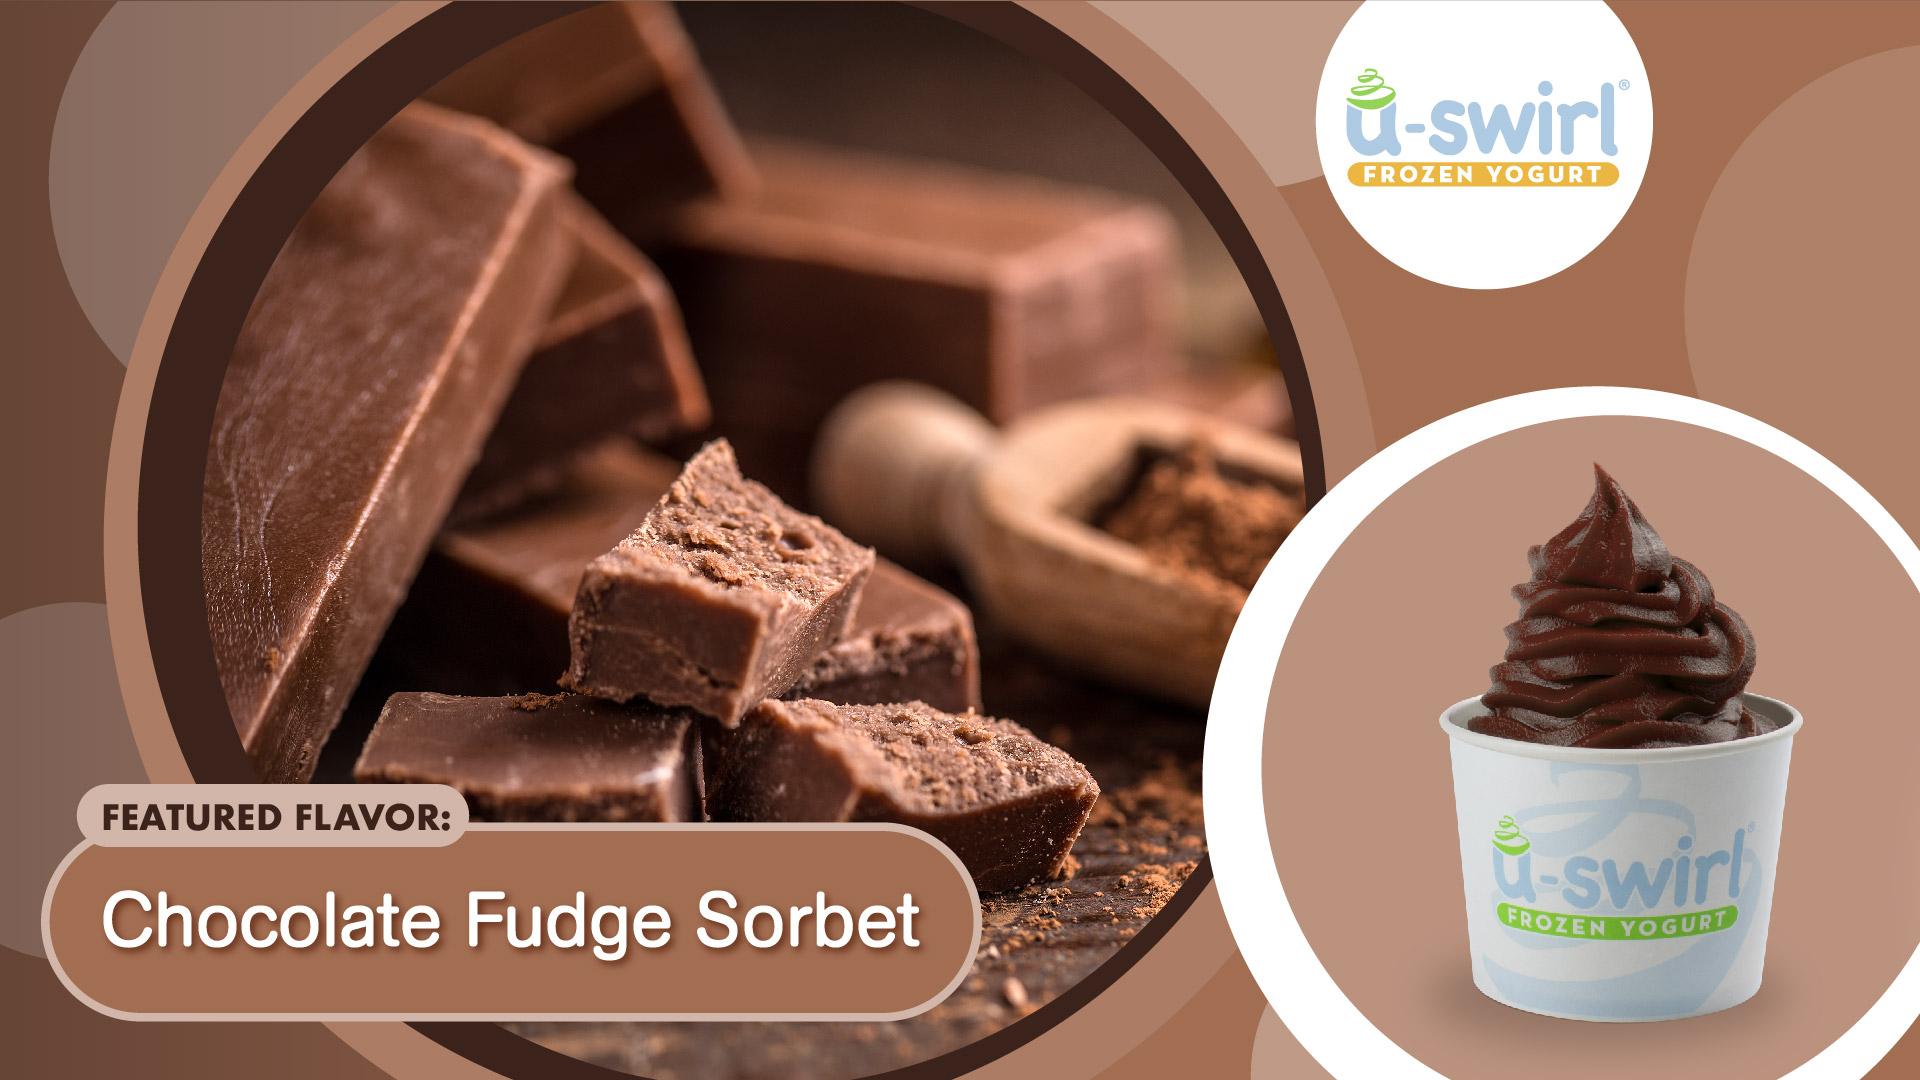 Chocolate Fudge Sorbet